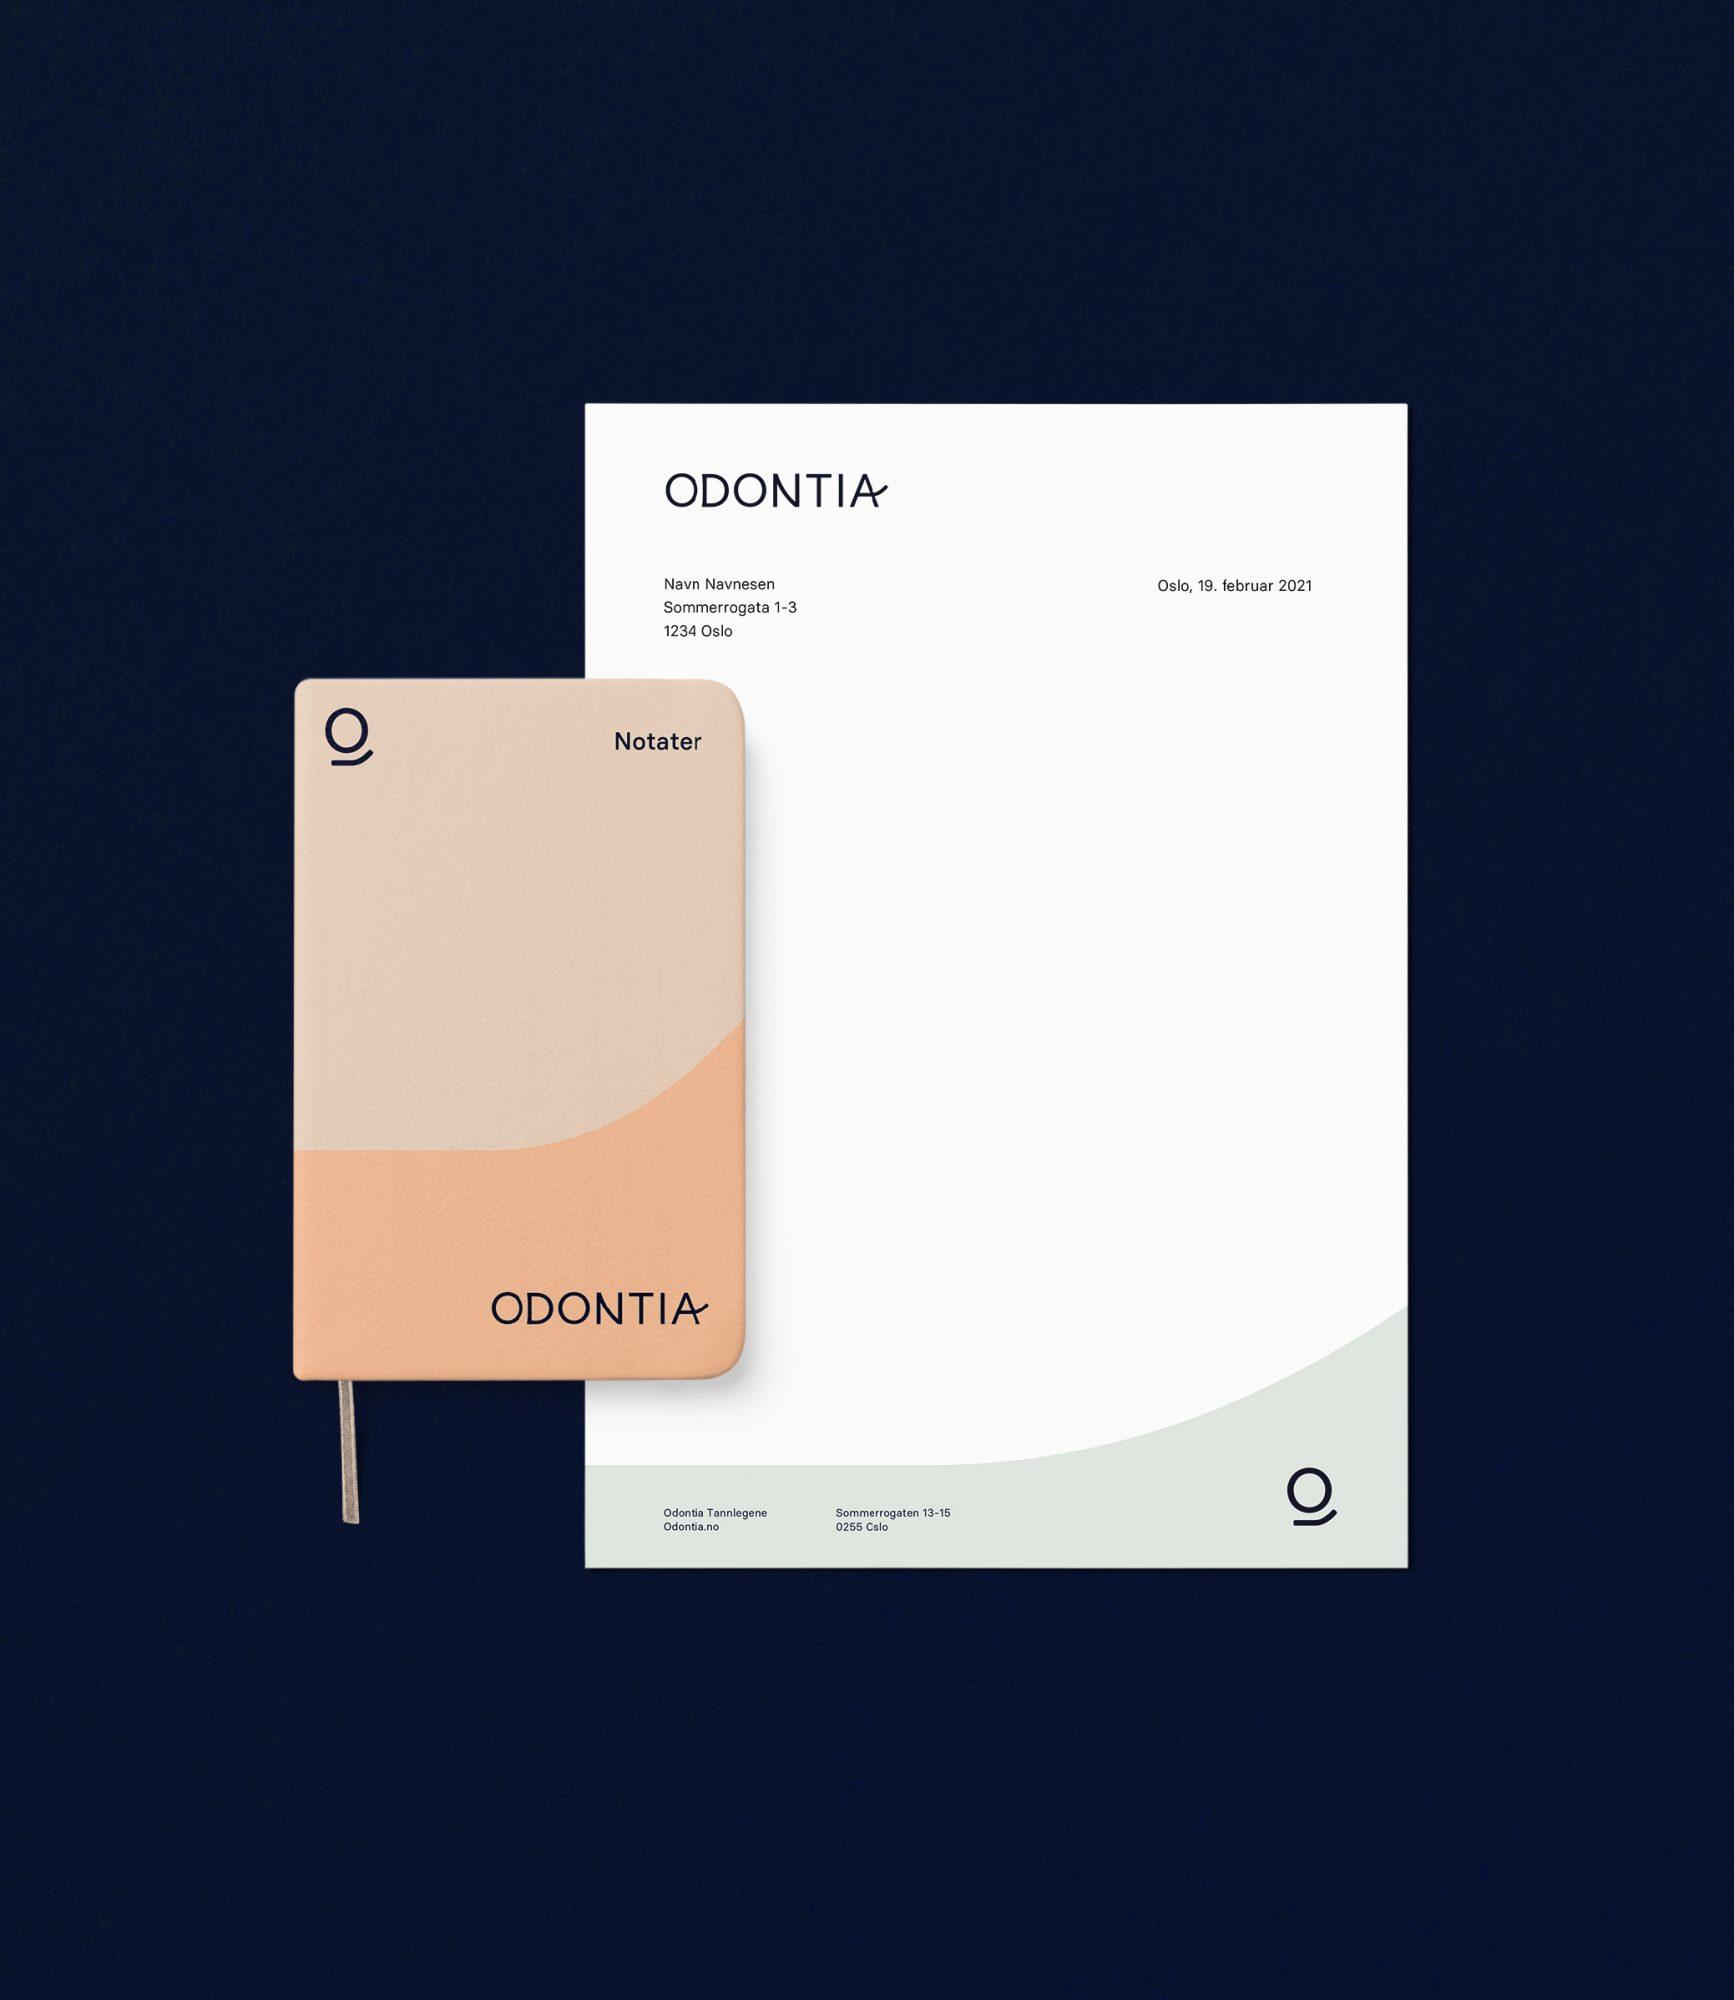 Odontia_dokumentasjon_230